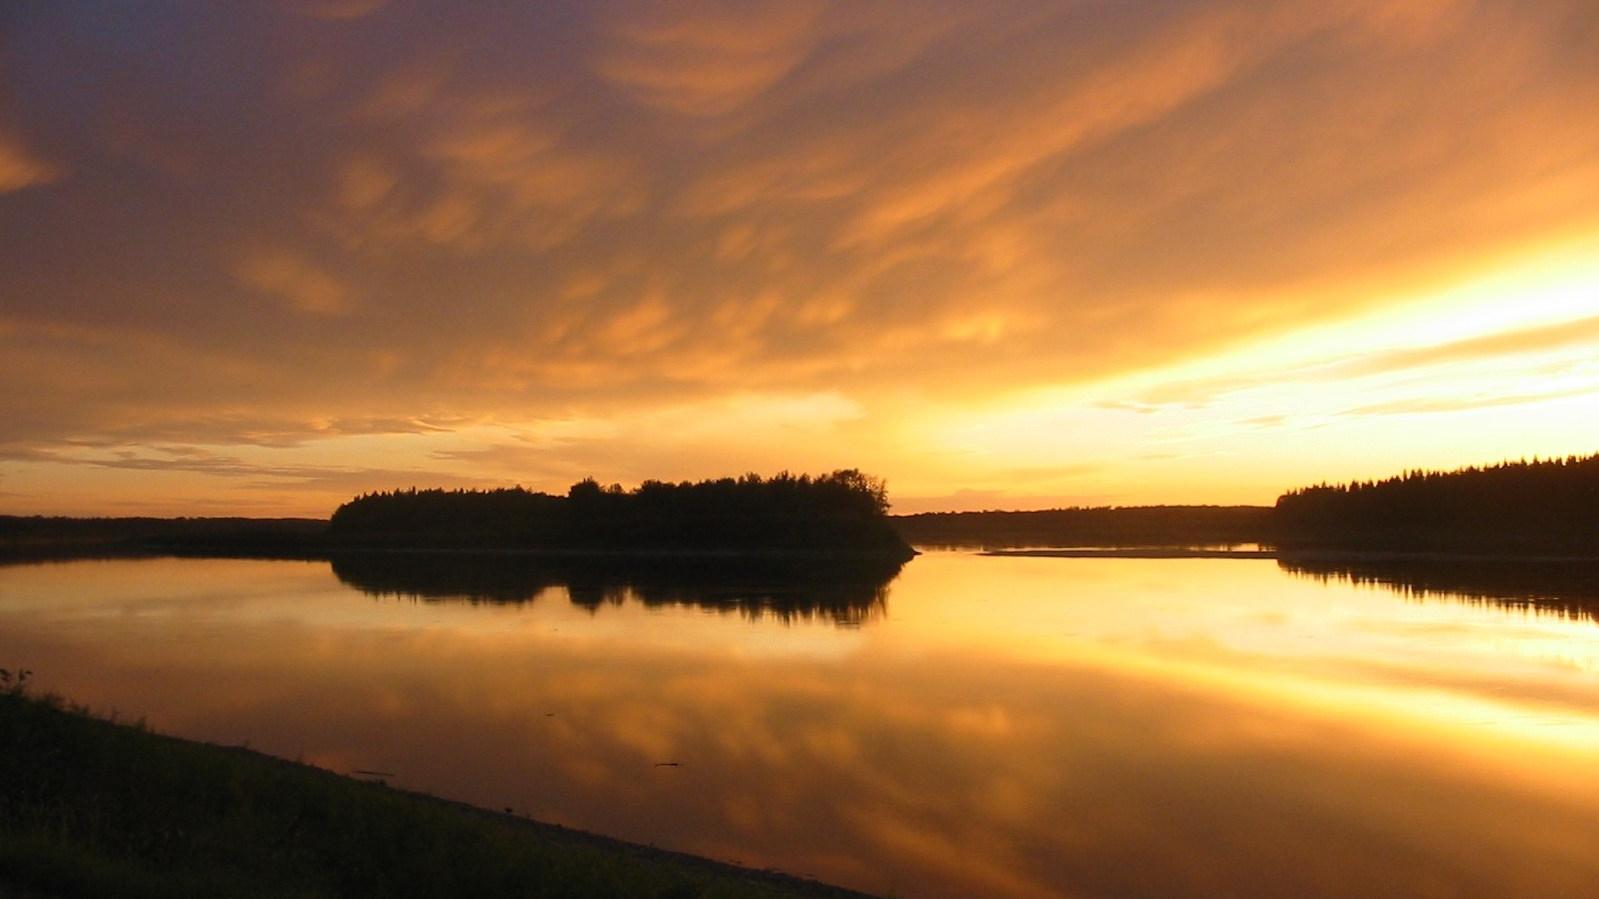 fortvermilion-sunset-e1577939642336.jpg